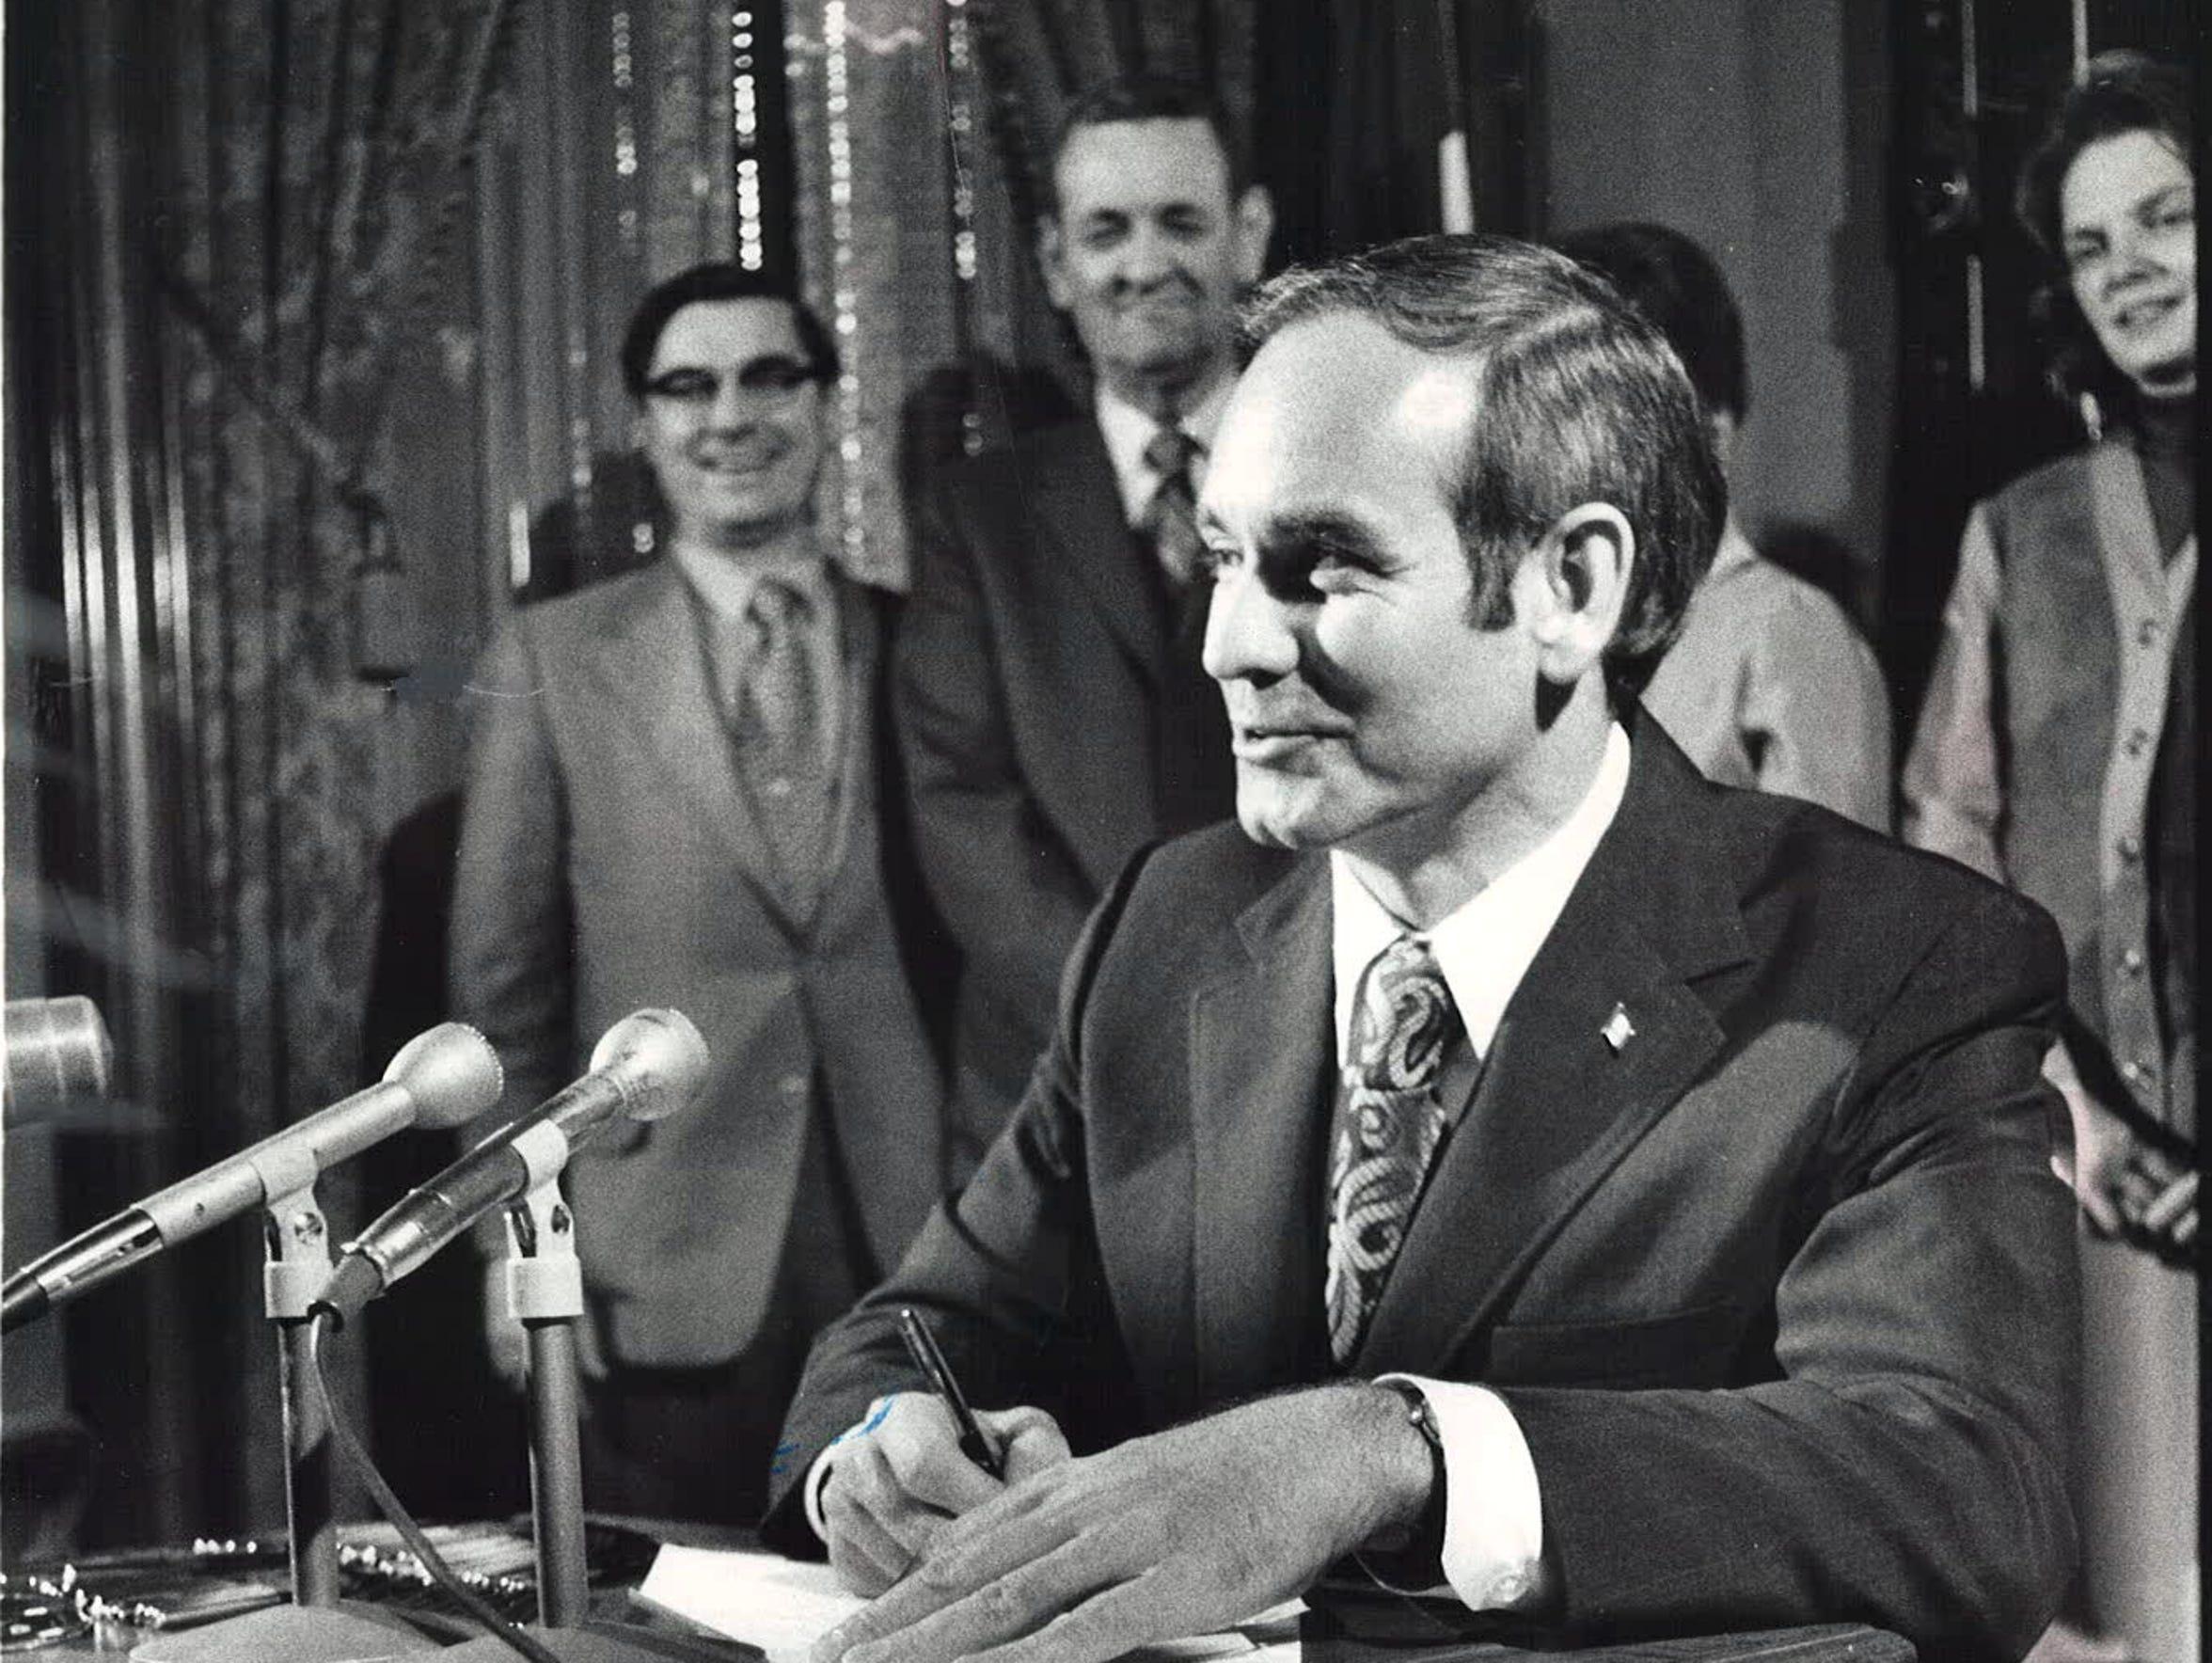 From 1972: Iowa Gov. Robert Ray signs legislation establishing